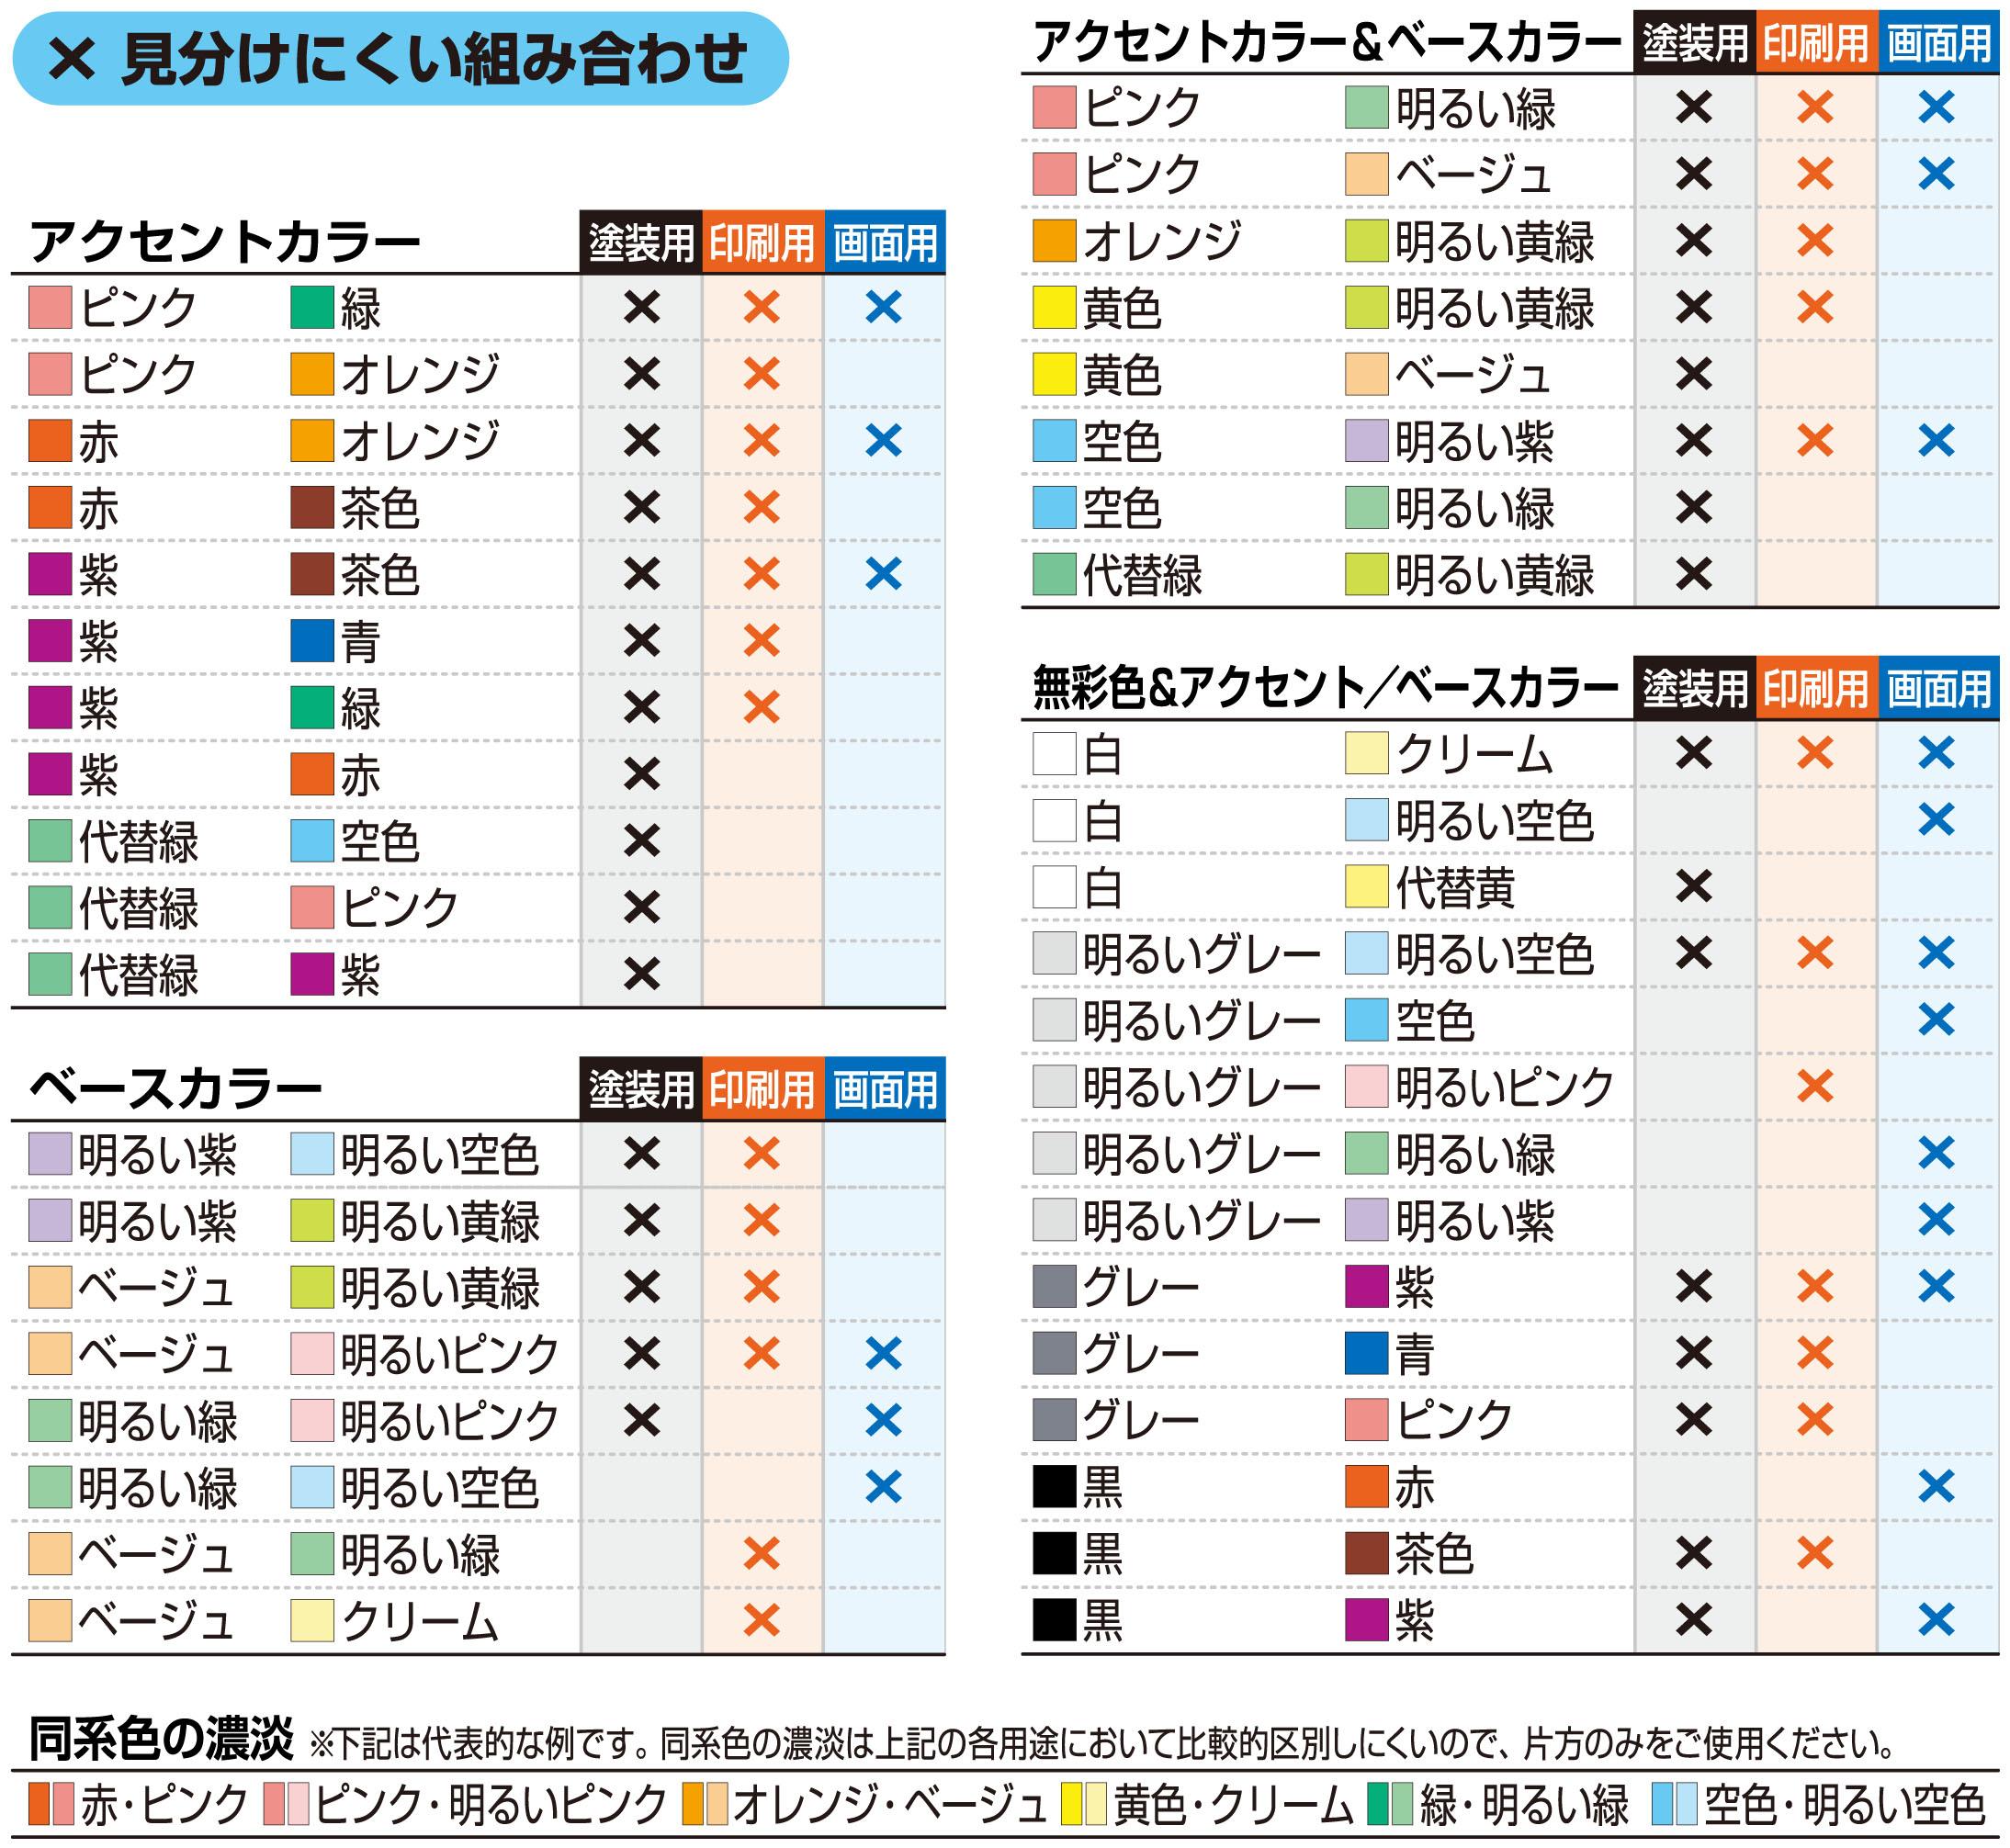 2 Color Combination カラーユニバーサルデザイン推奨配色セット